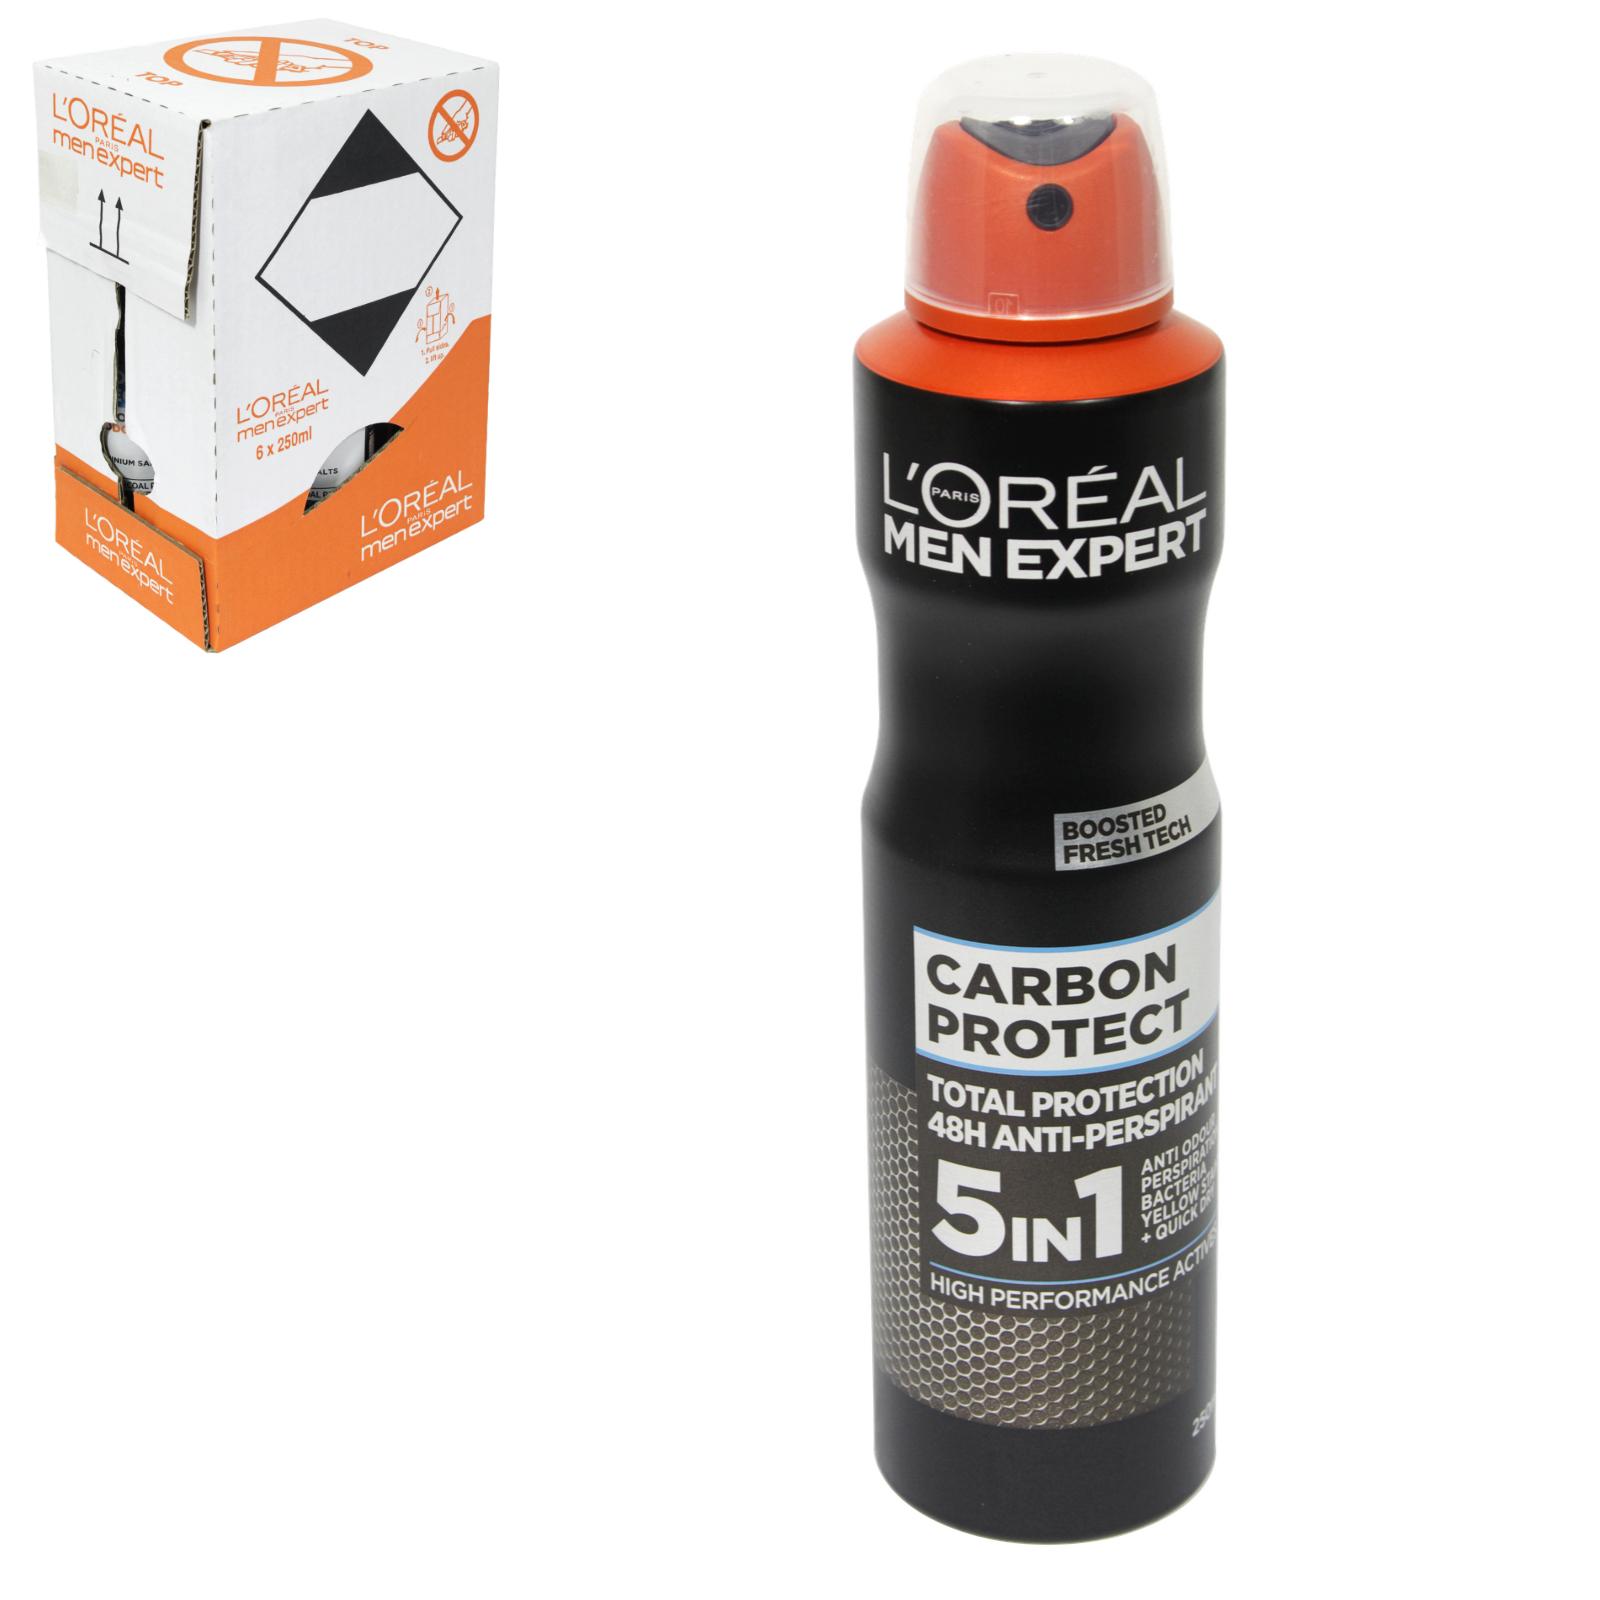 LOREAL MEN EXPERT DEO 250ML BLACK MINERAL X6